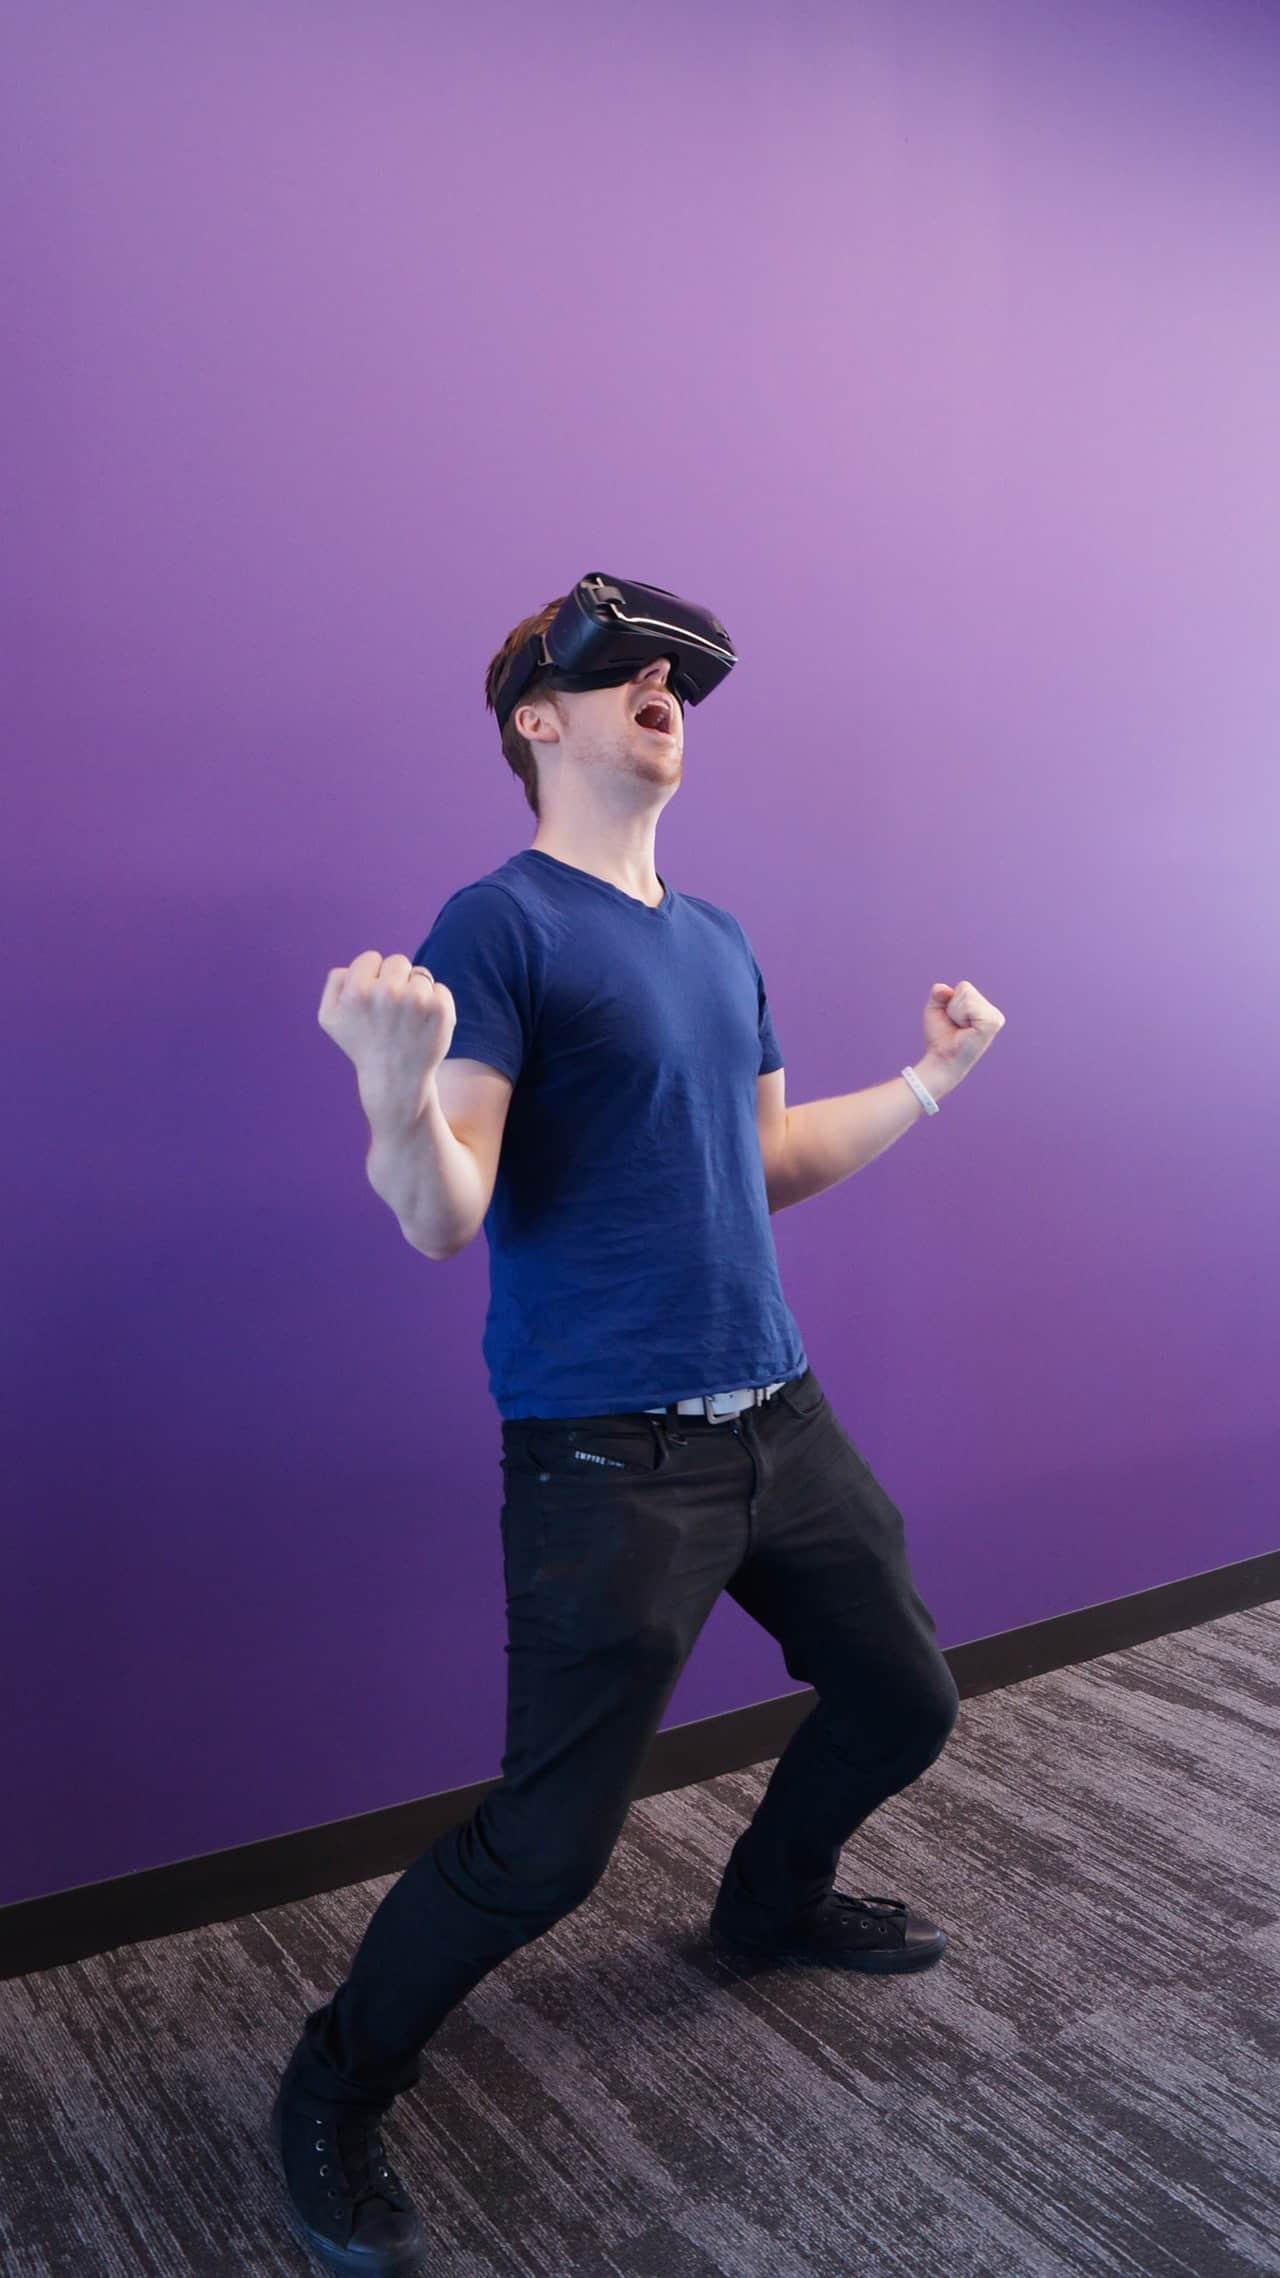 Future Hi-Tech Gaming Article Image